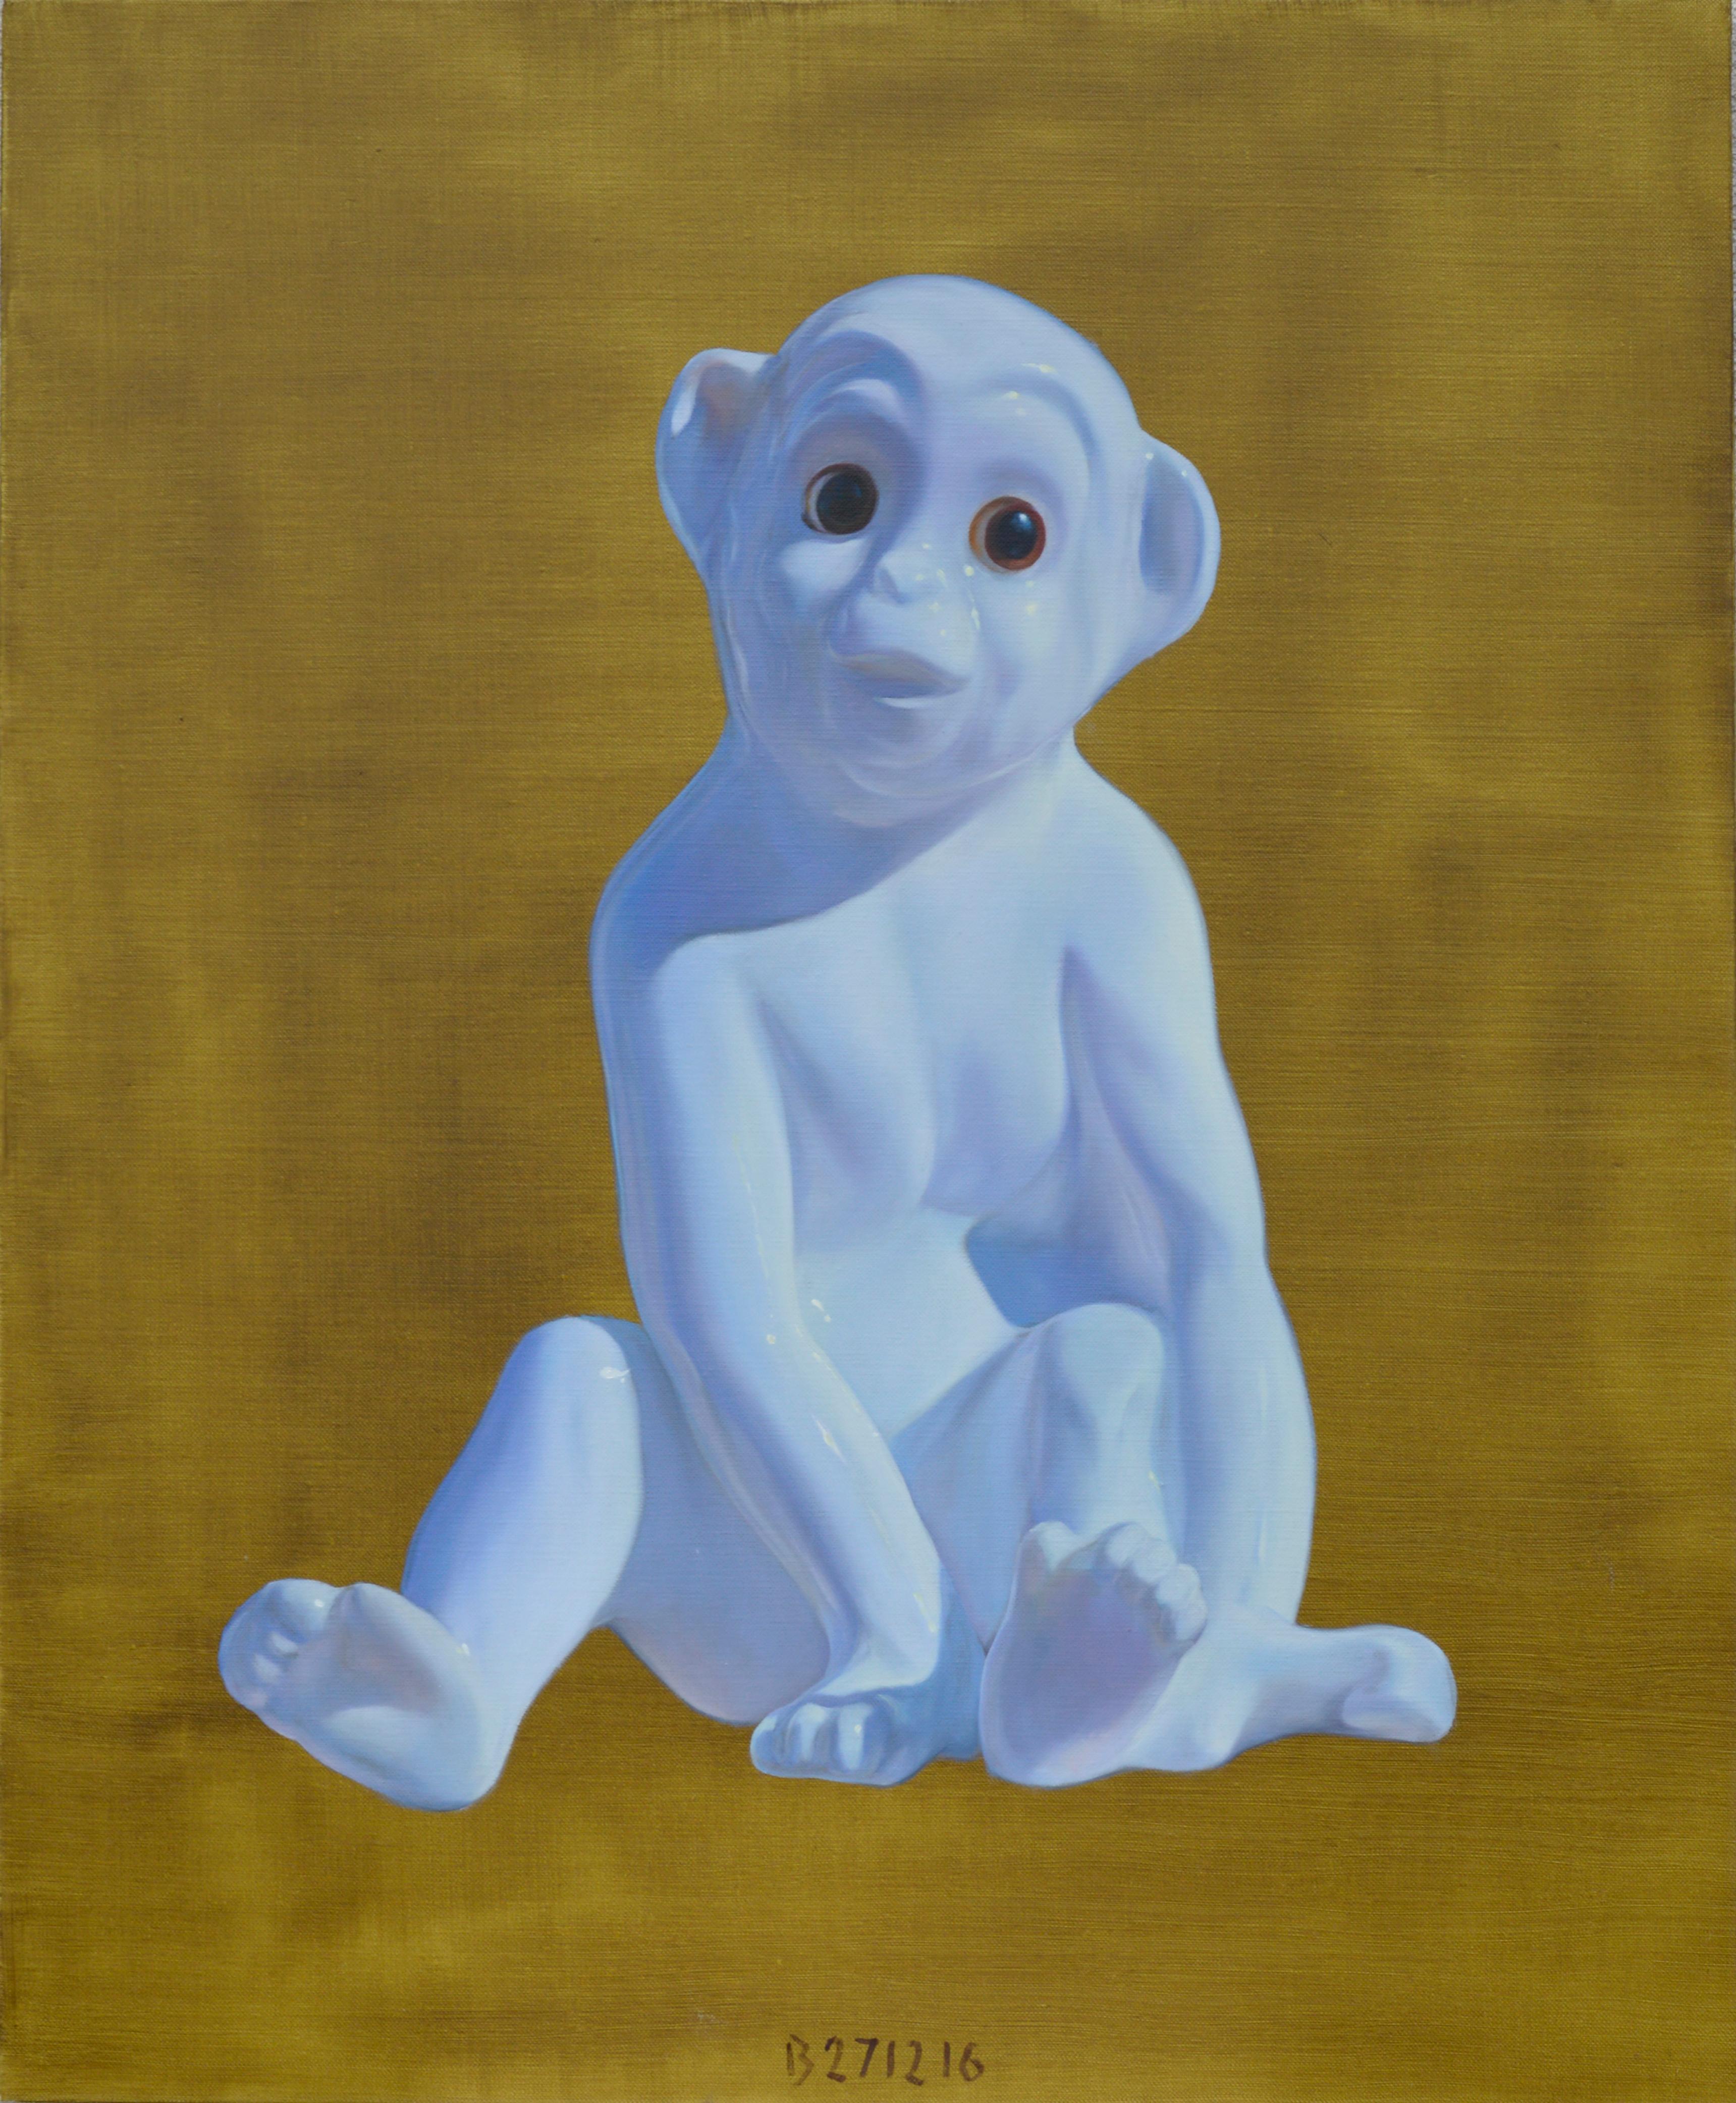 Porcelain Monkey - Contemporary Figurative Animals Oil Painting, Photorealism